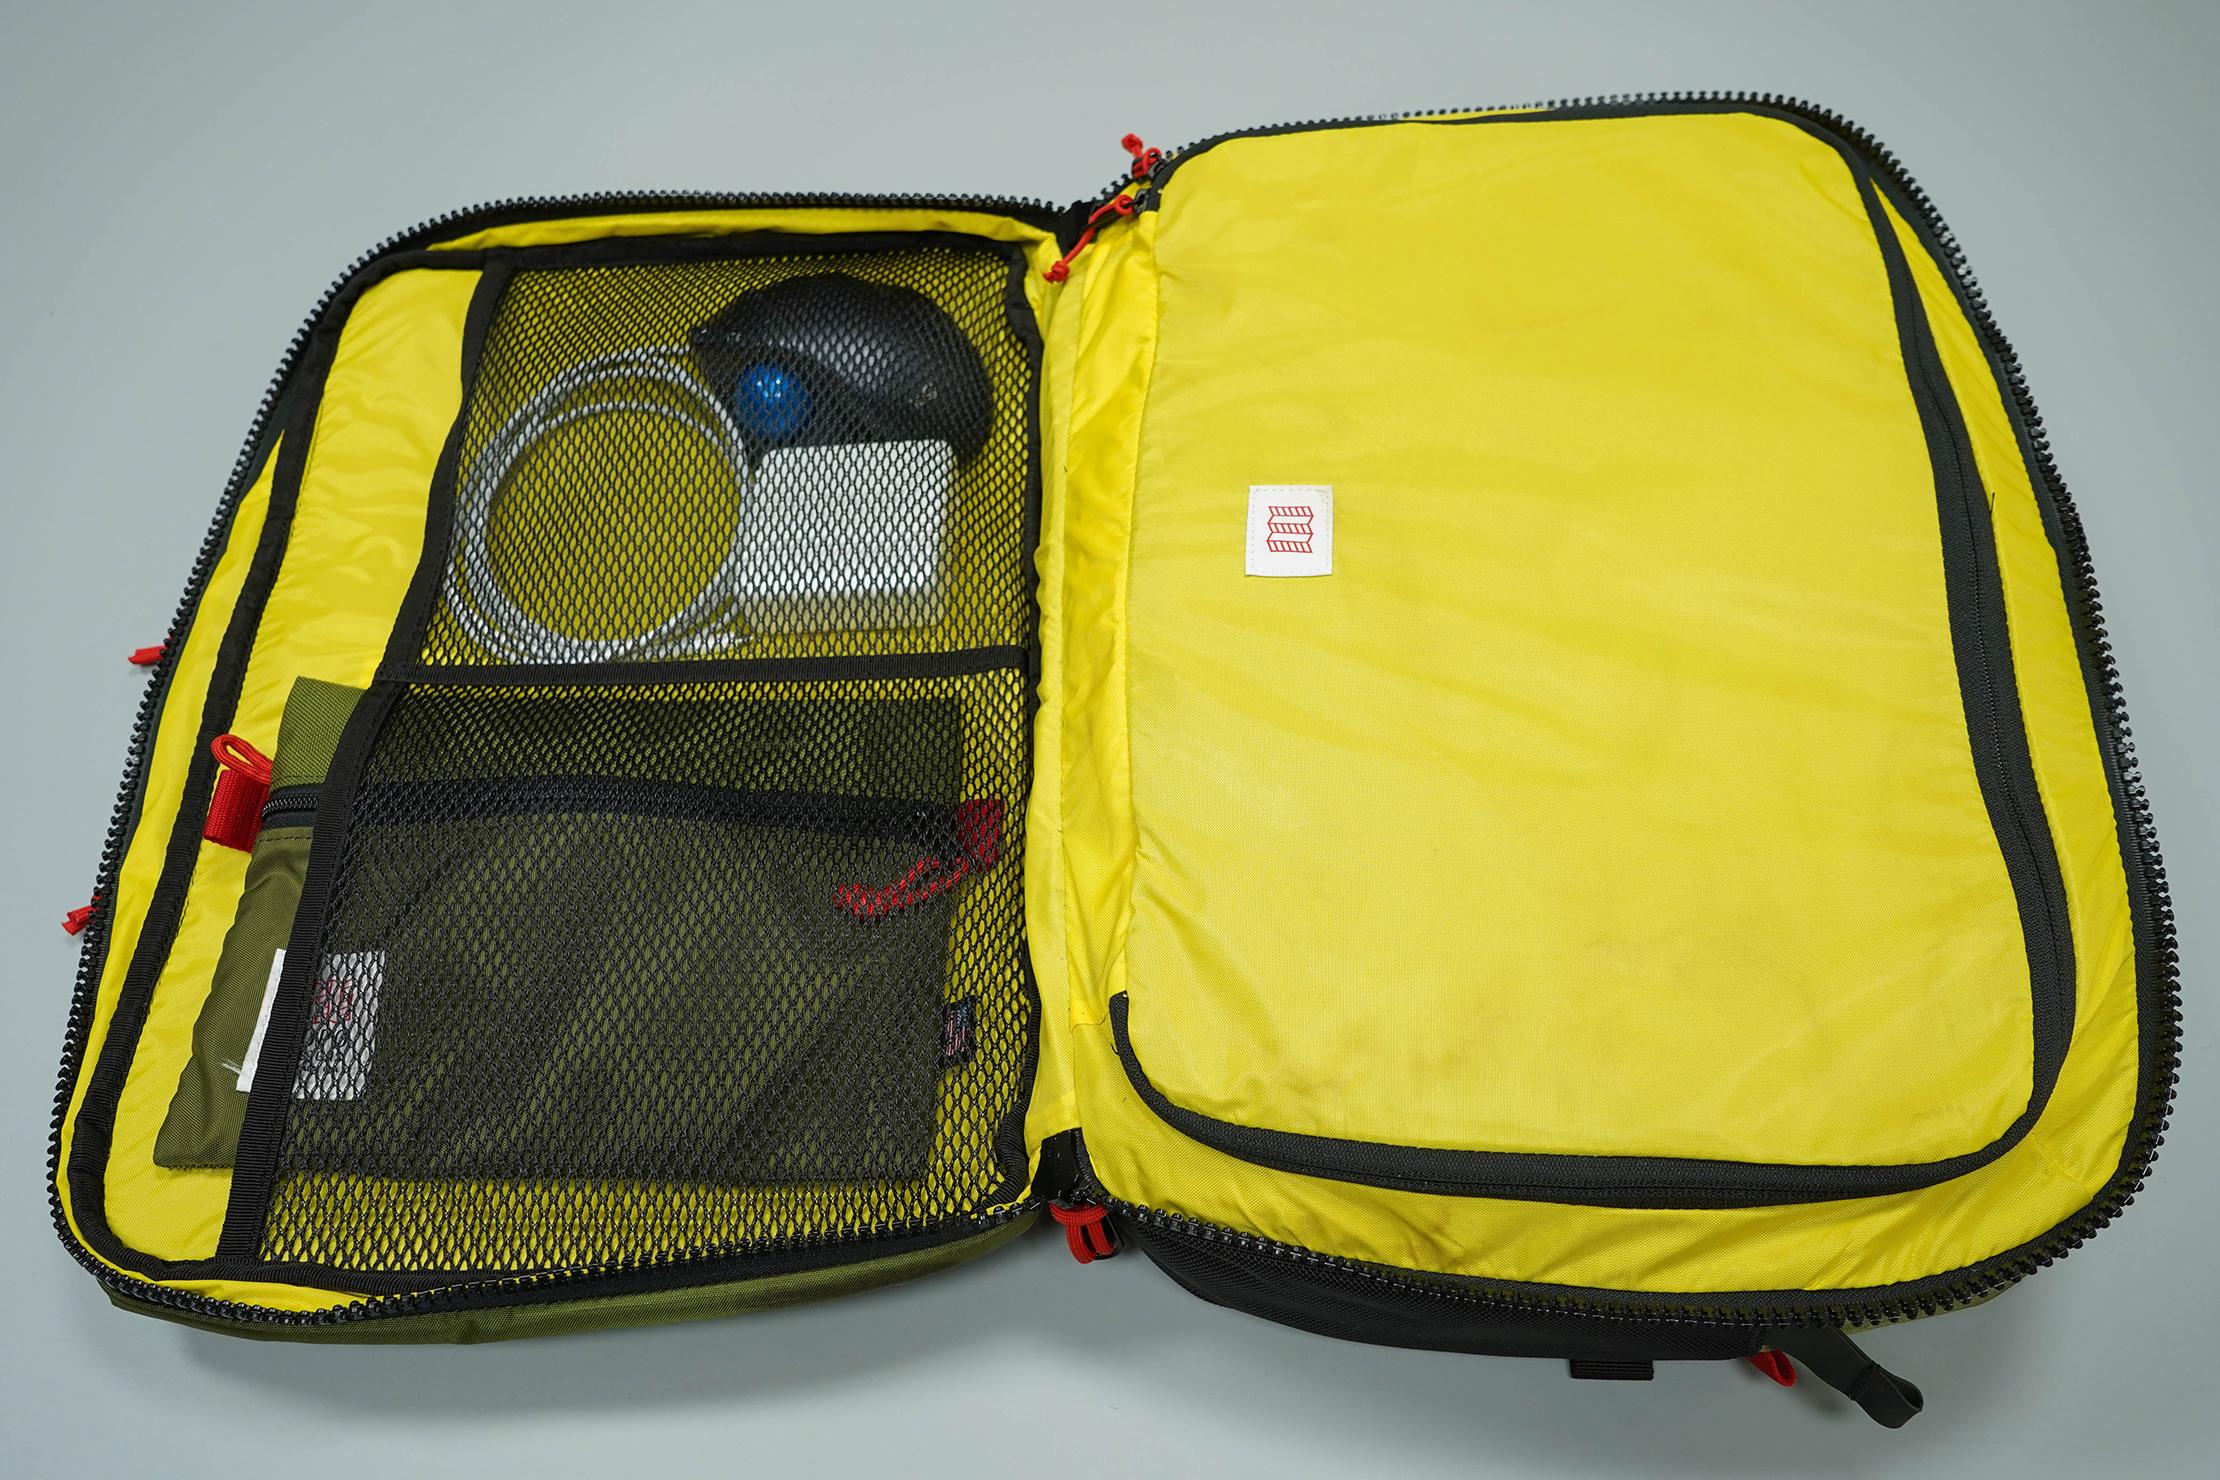 Topo Designs Global Briefcase 3-Day Main Open